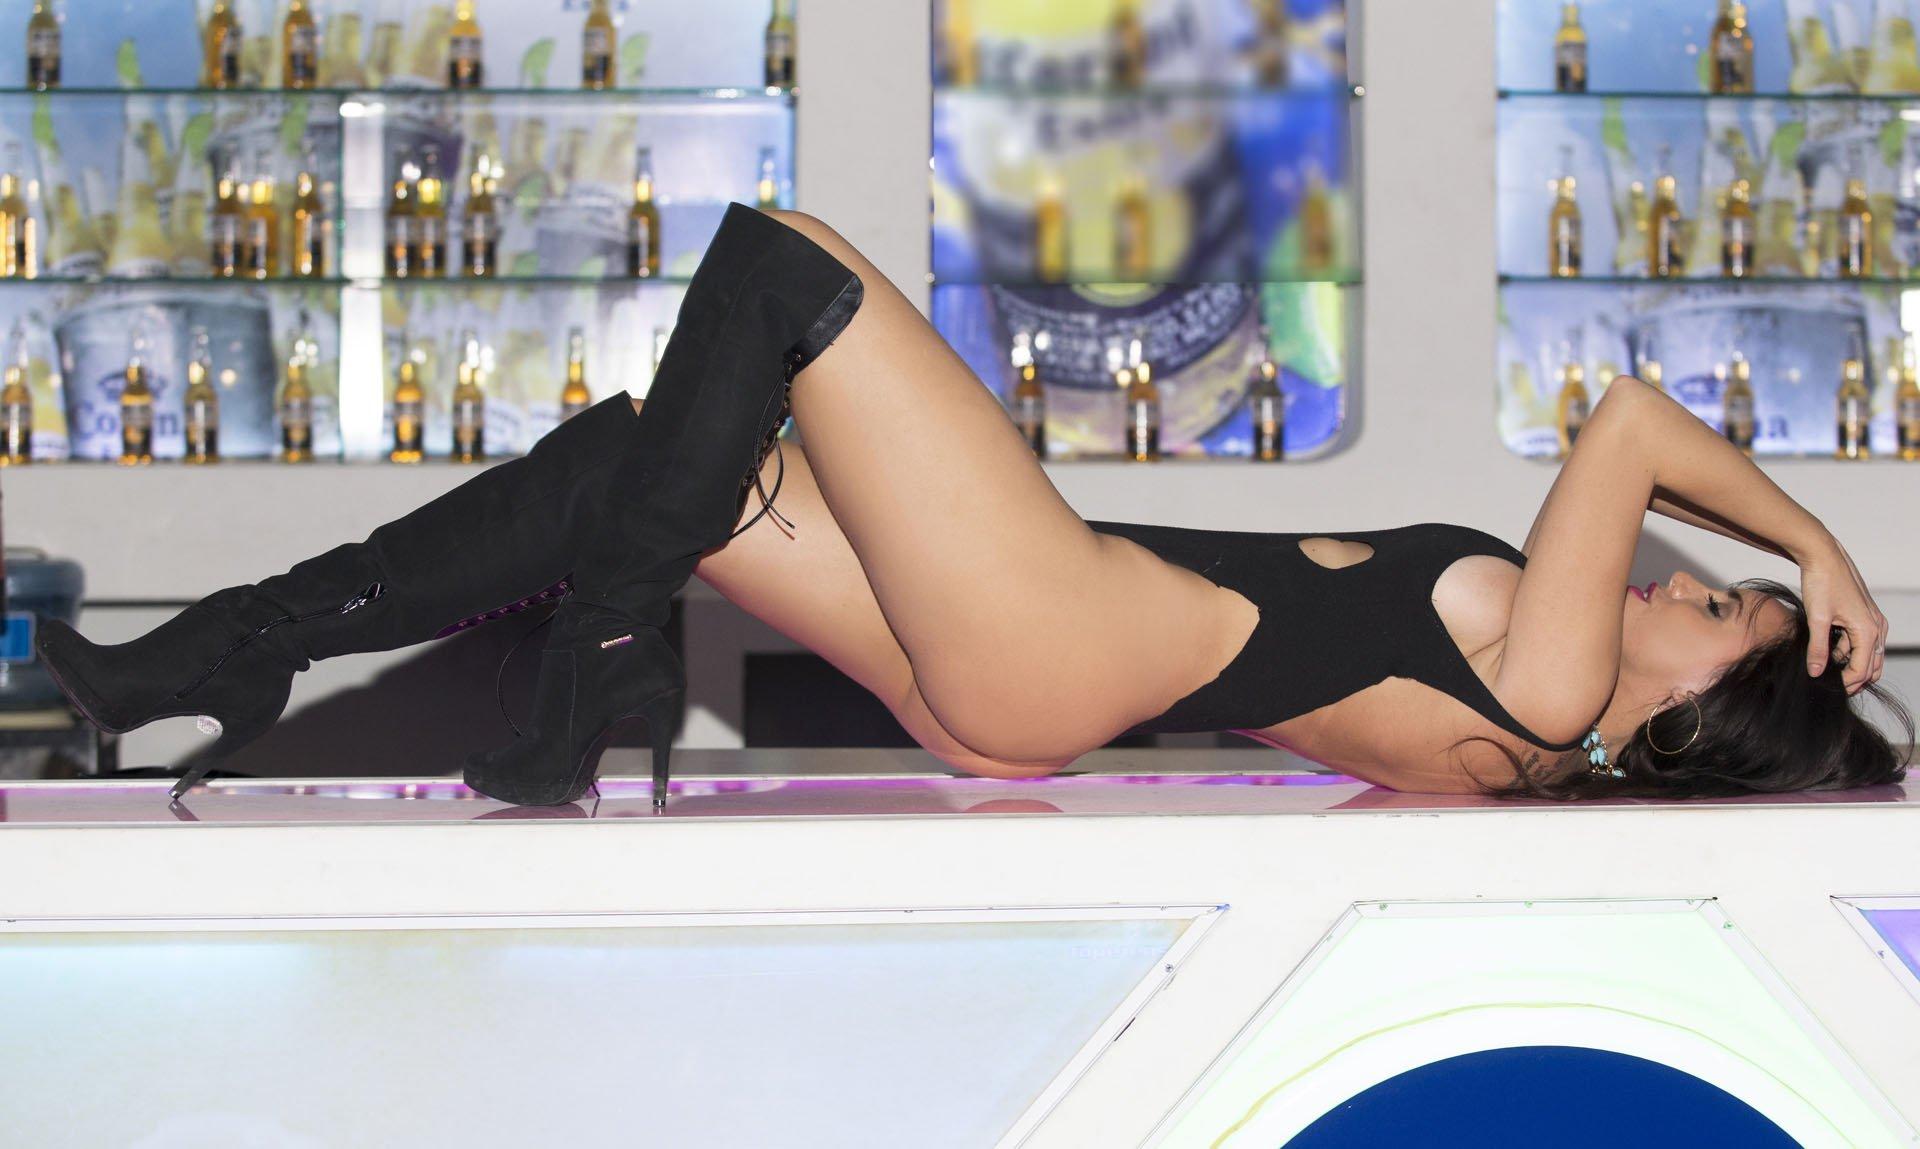 Cintia Alonso